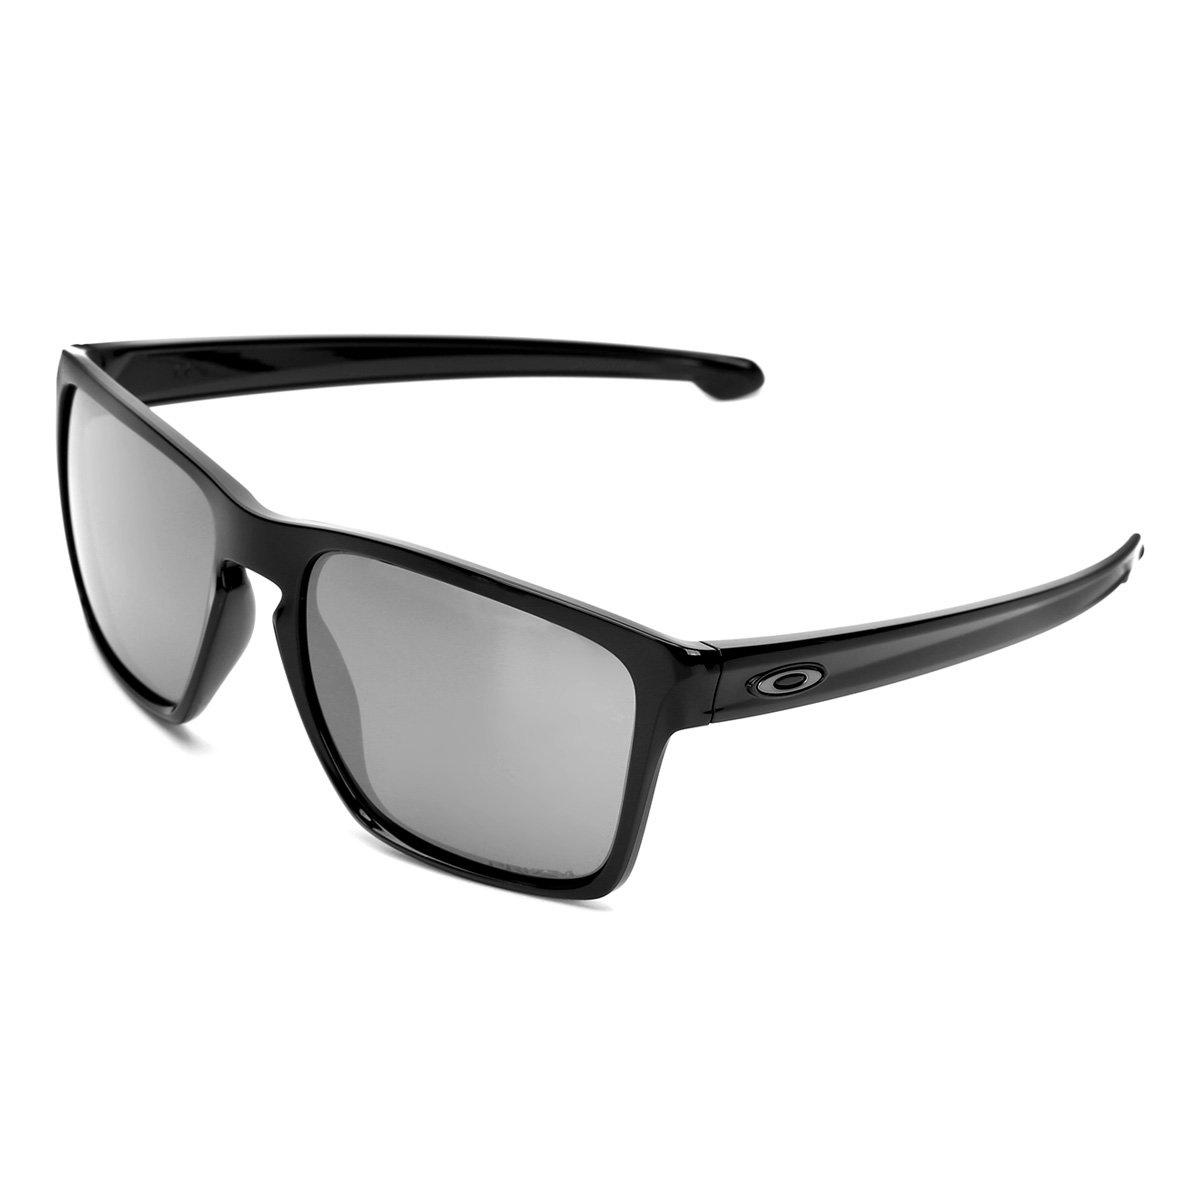 9c290deb55f90 Óculos de Sol Oakley Sliver Xl Masculino - Preto e Cinza - Compre Agora